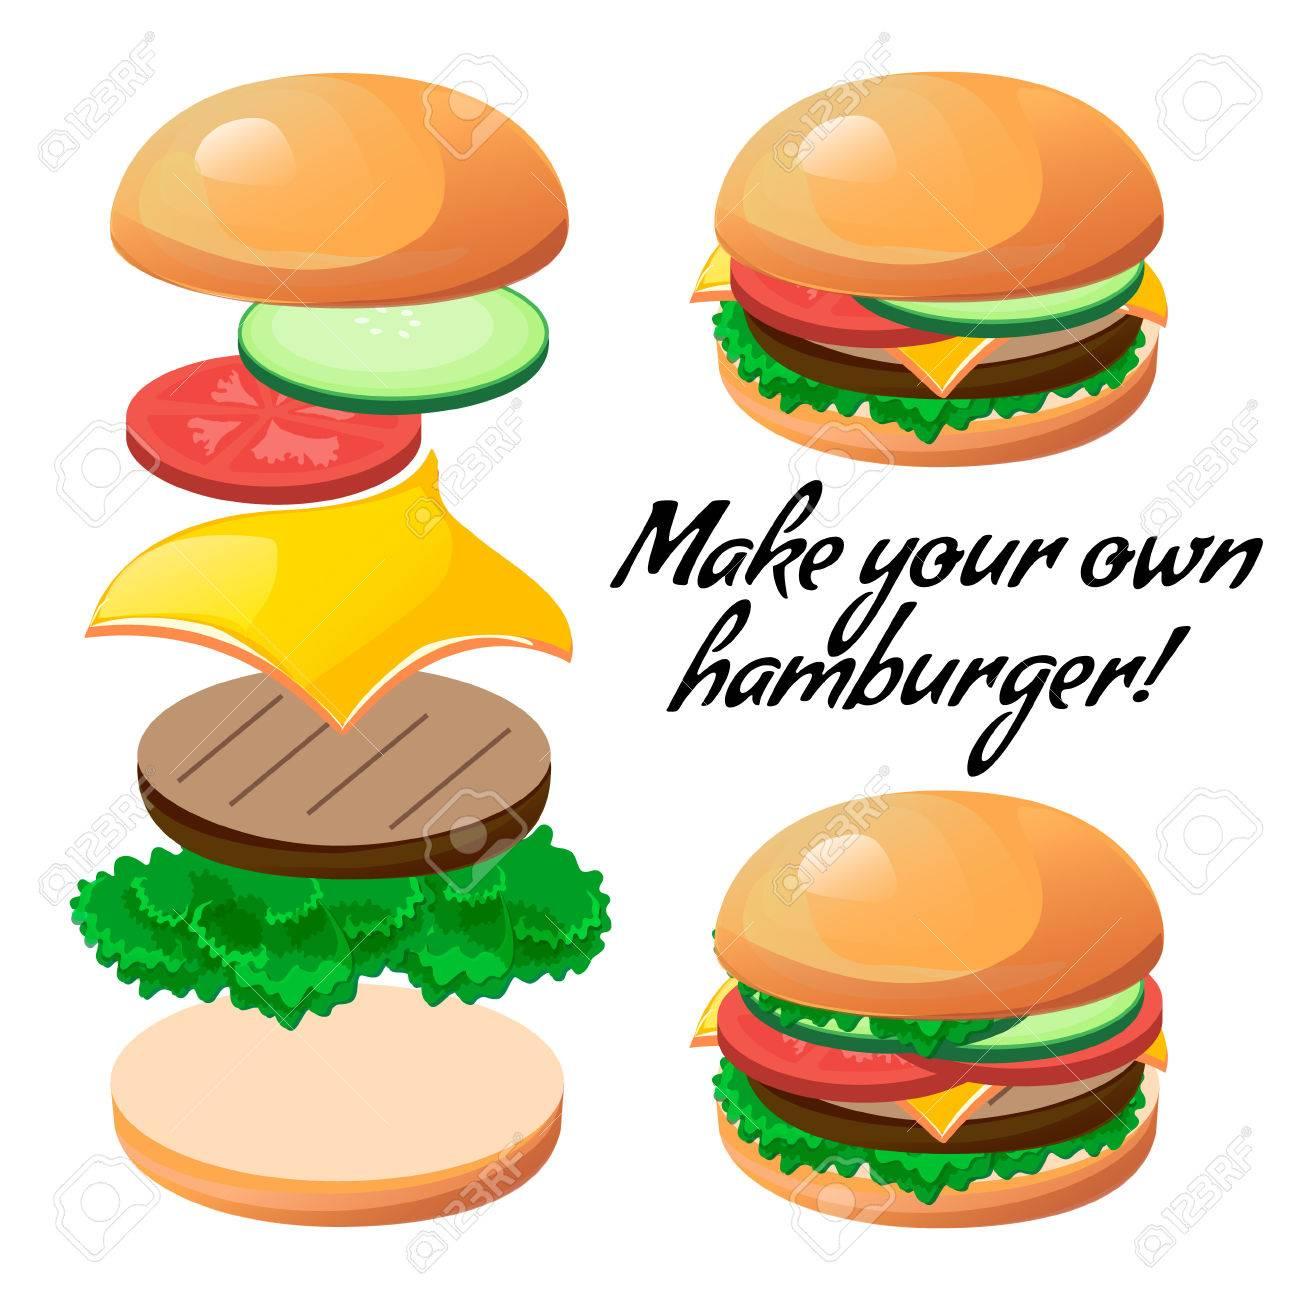 tasty vector ingredients to make a custom burger design element